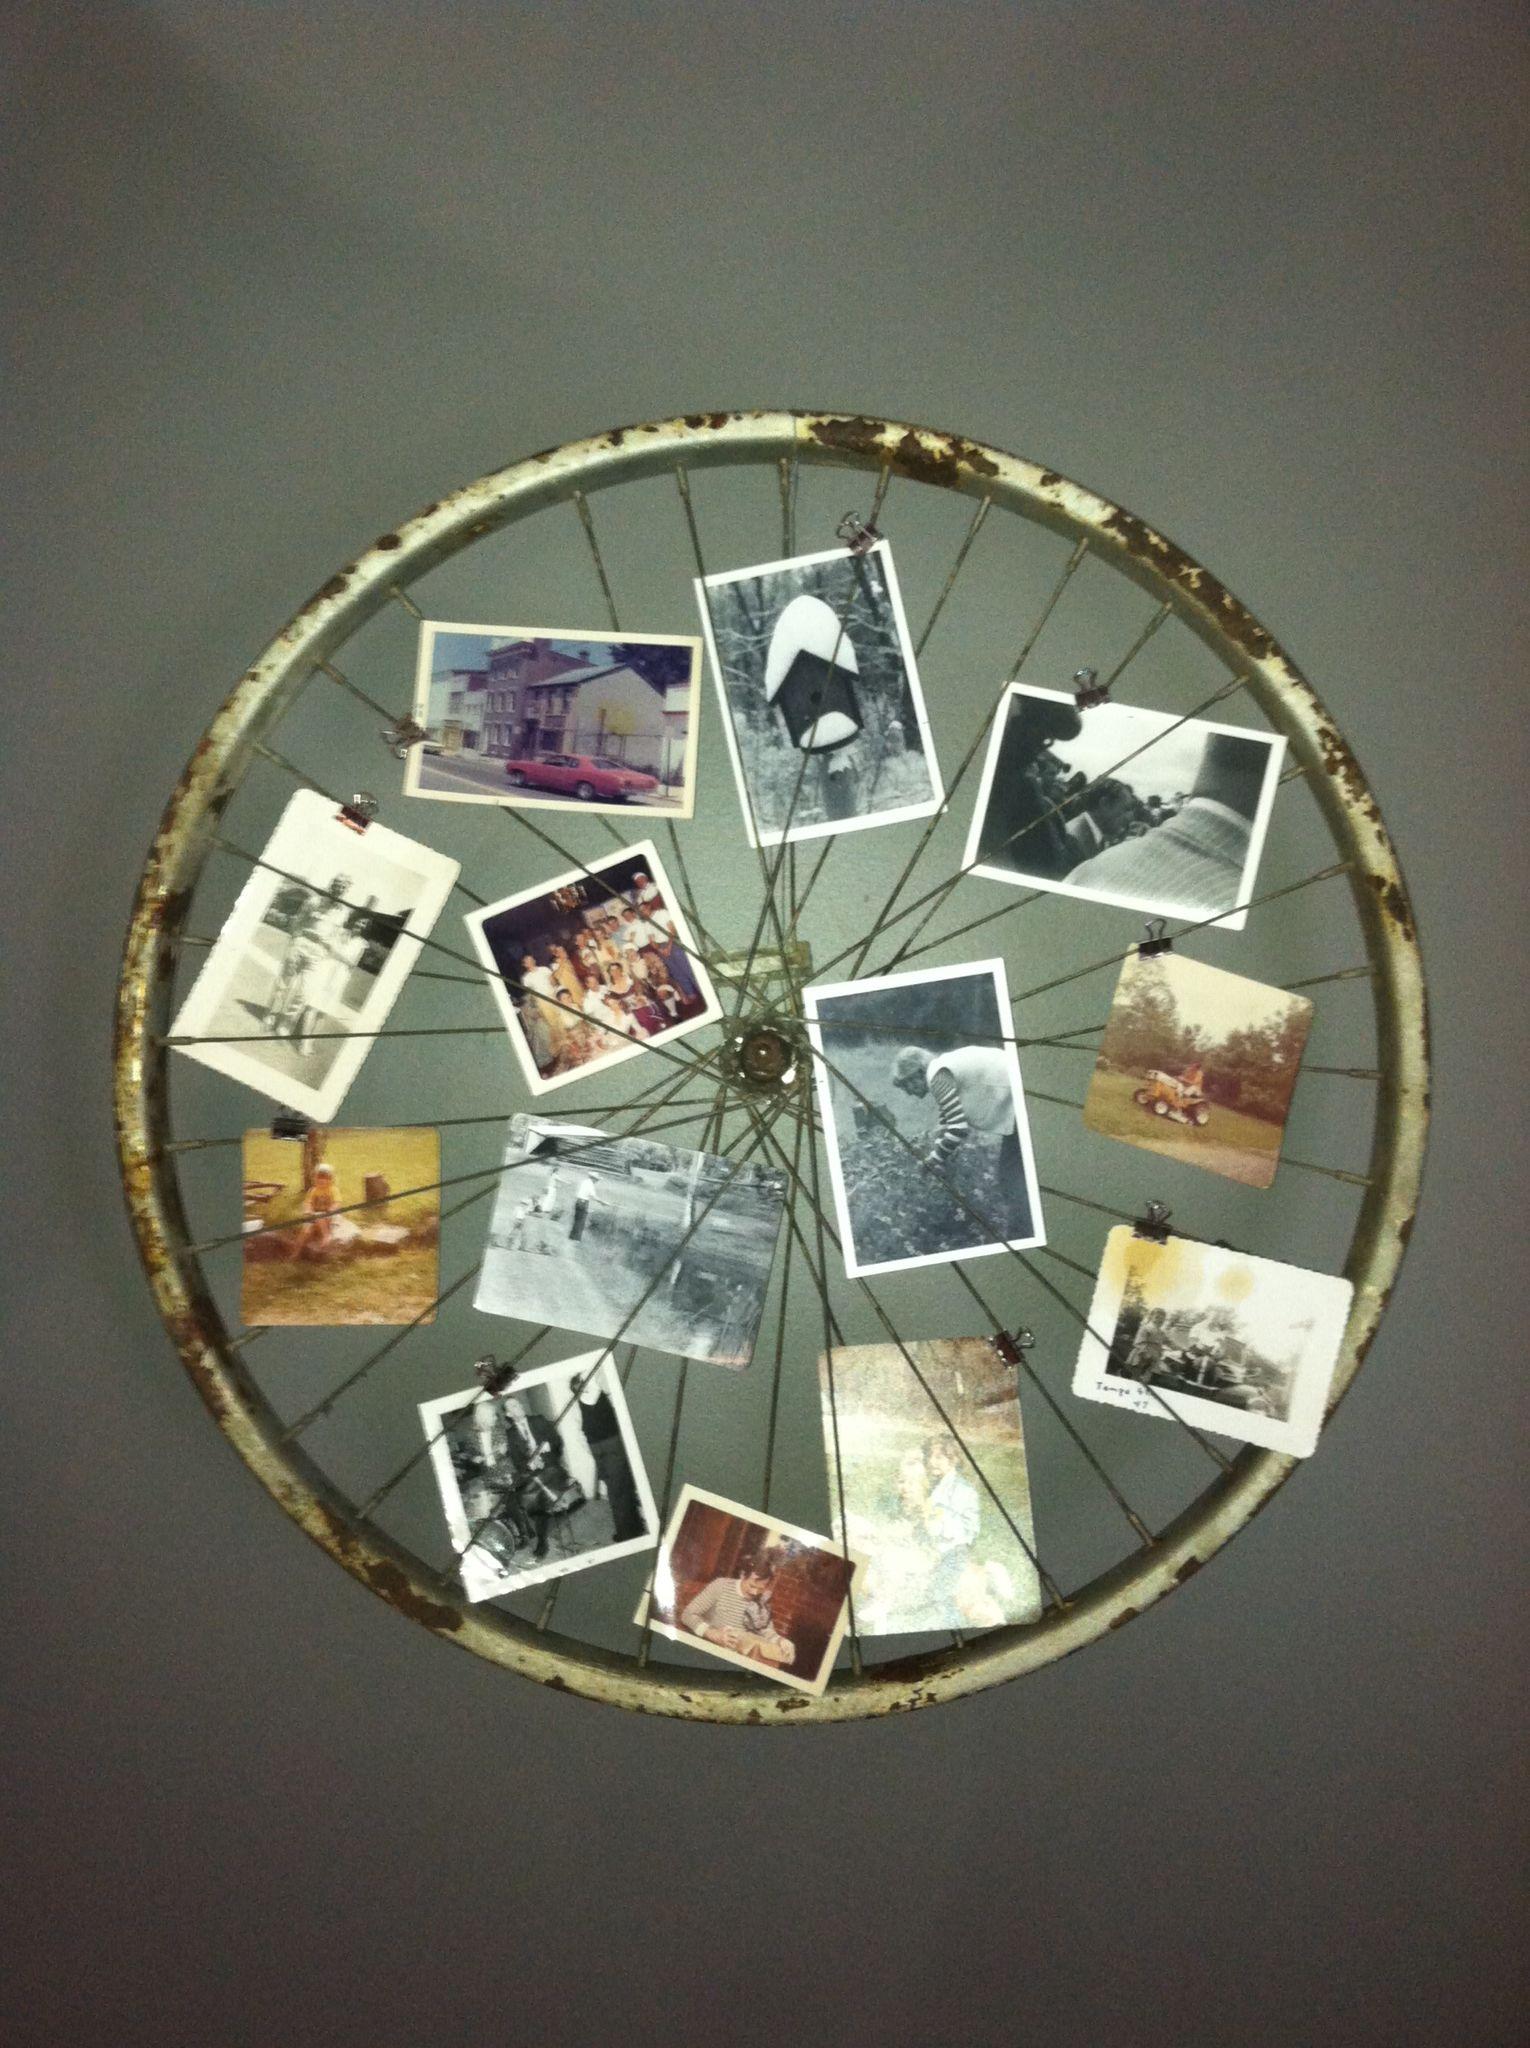 creative photo collage ideas